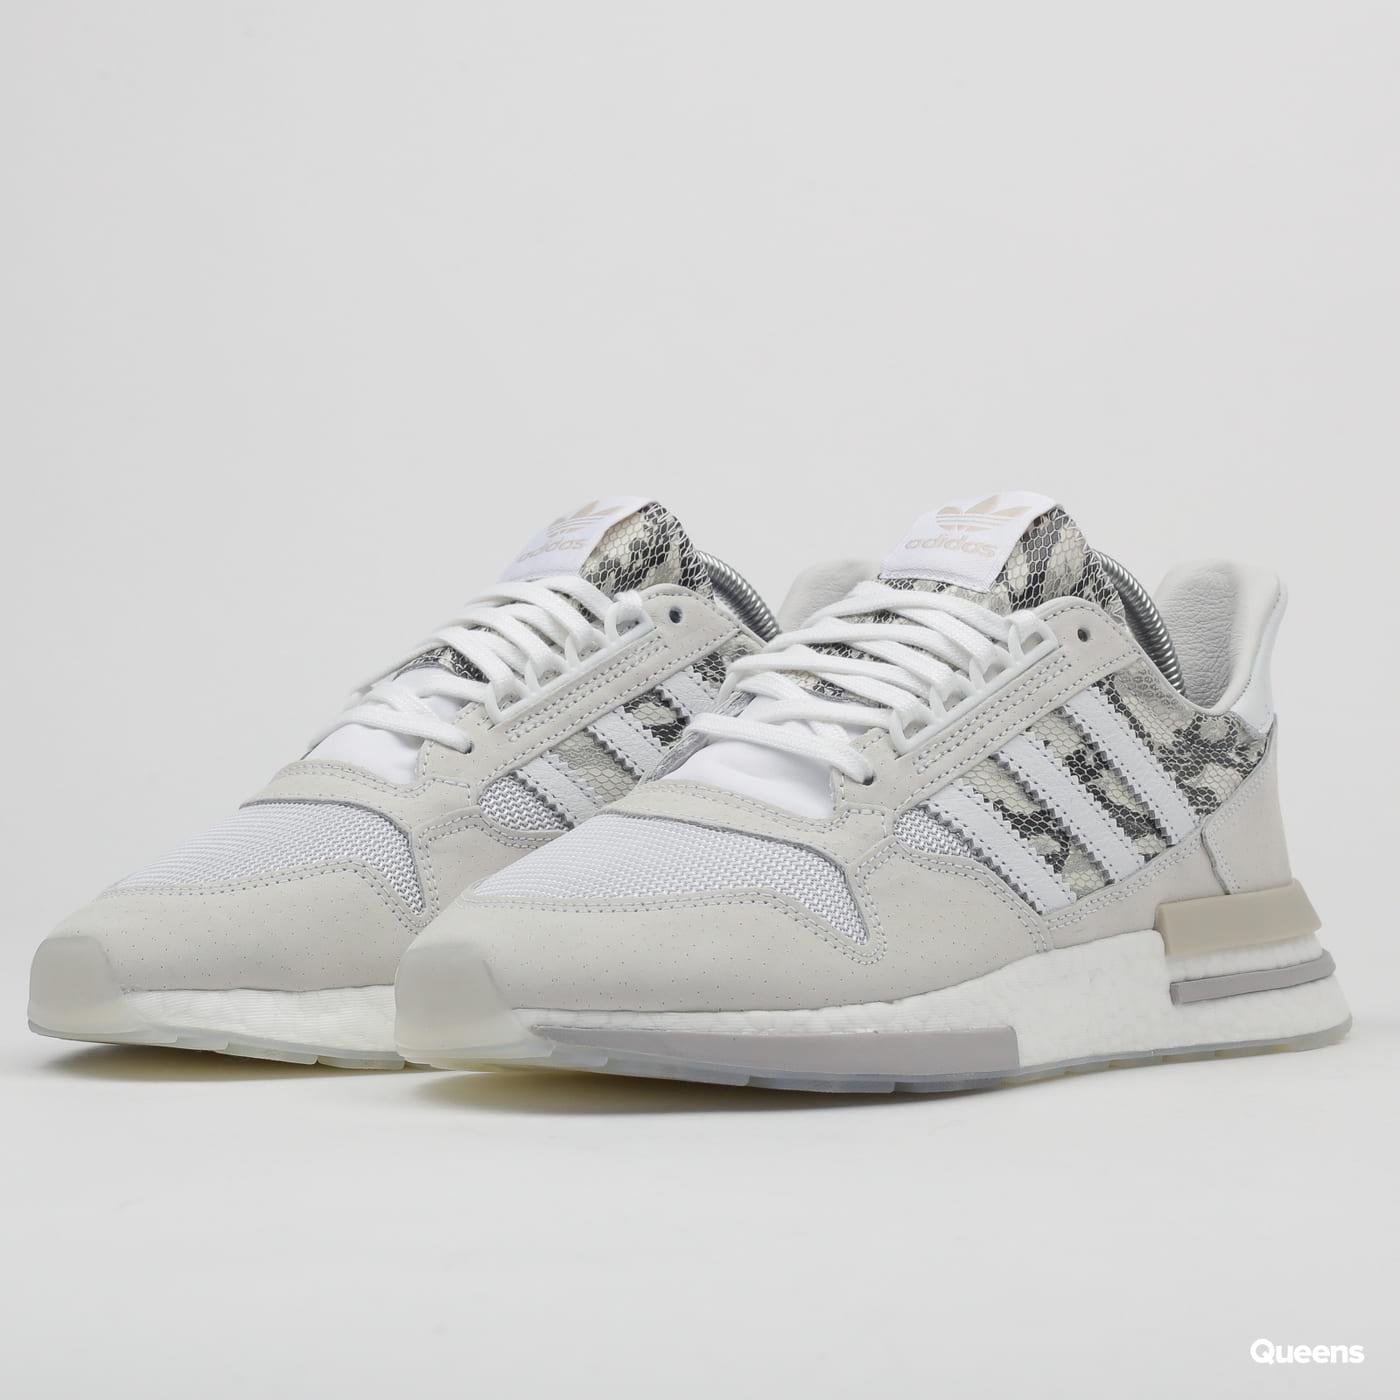 8dab992b5f5f5 bd7873 Queens Adidas Originals Boty Zx – 500 Rm axXZ6AzqAw